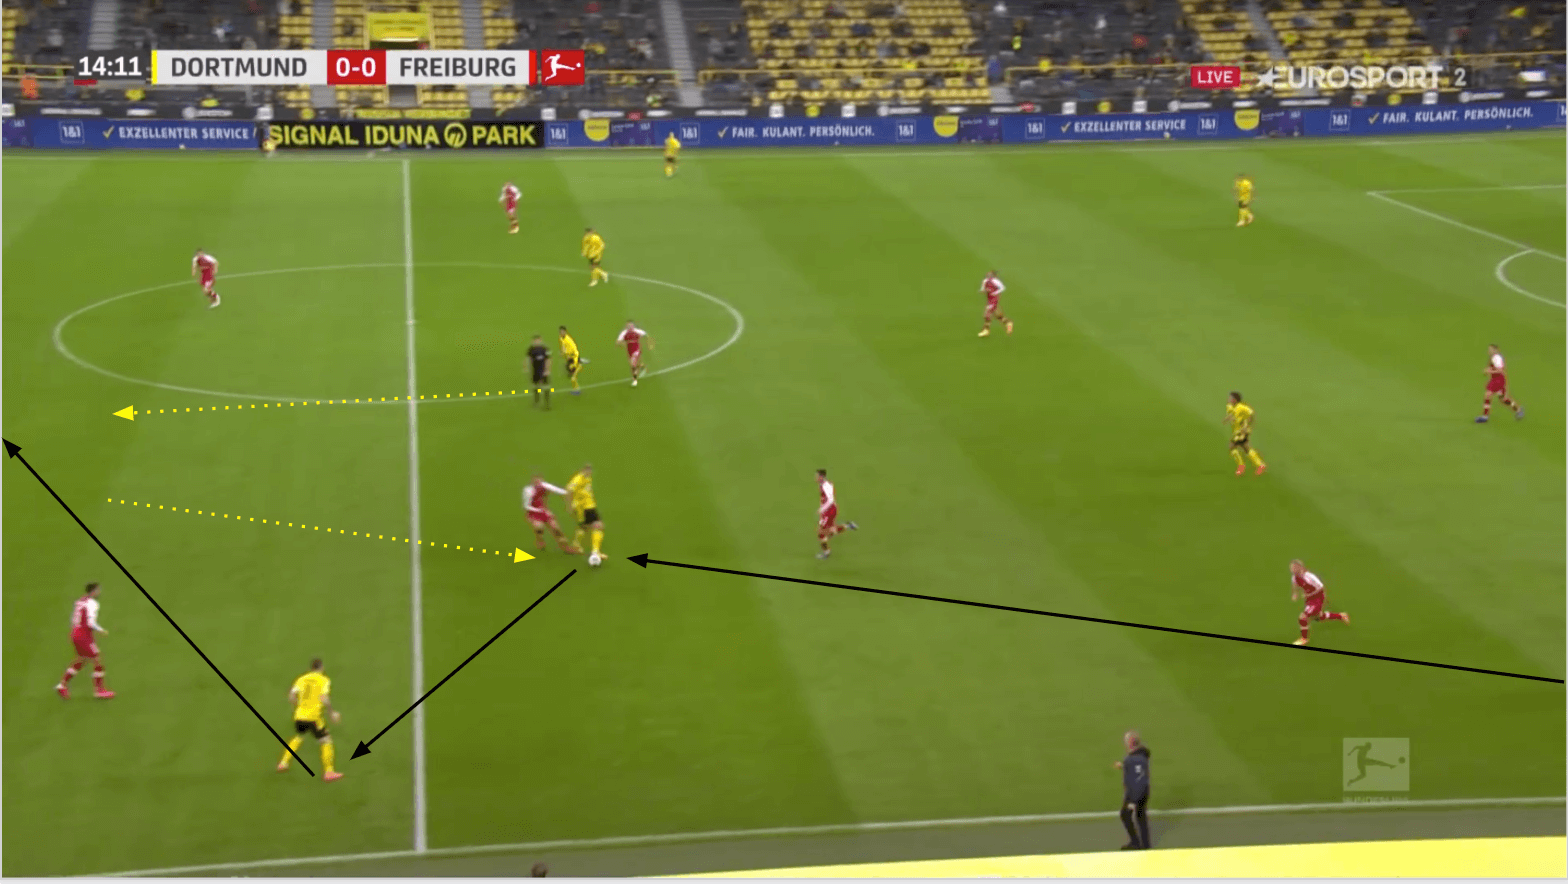 Bundesliga 2020/21: Borussia Dortmund vs SC Freiburg - tactical analysis tactics